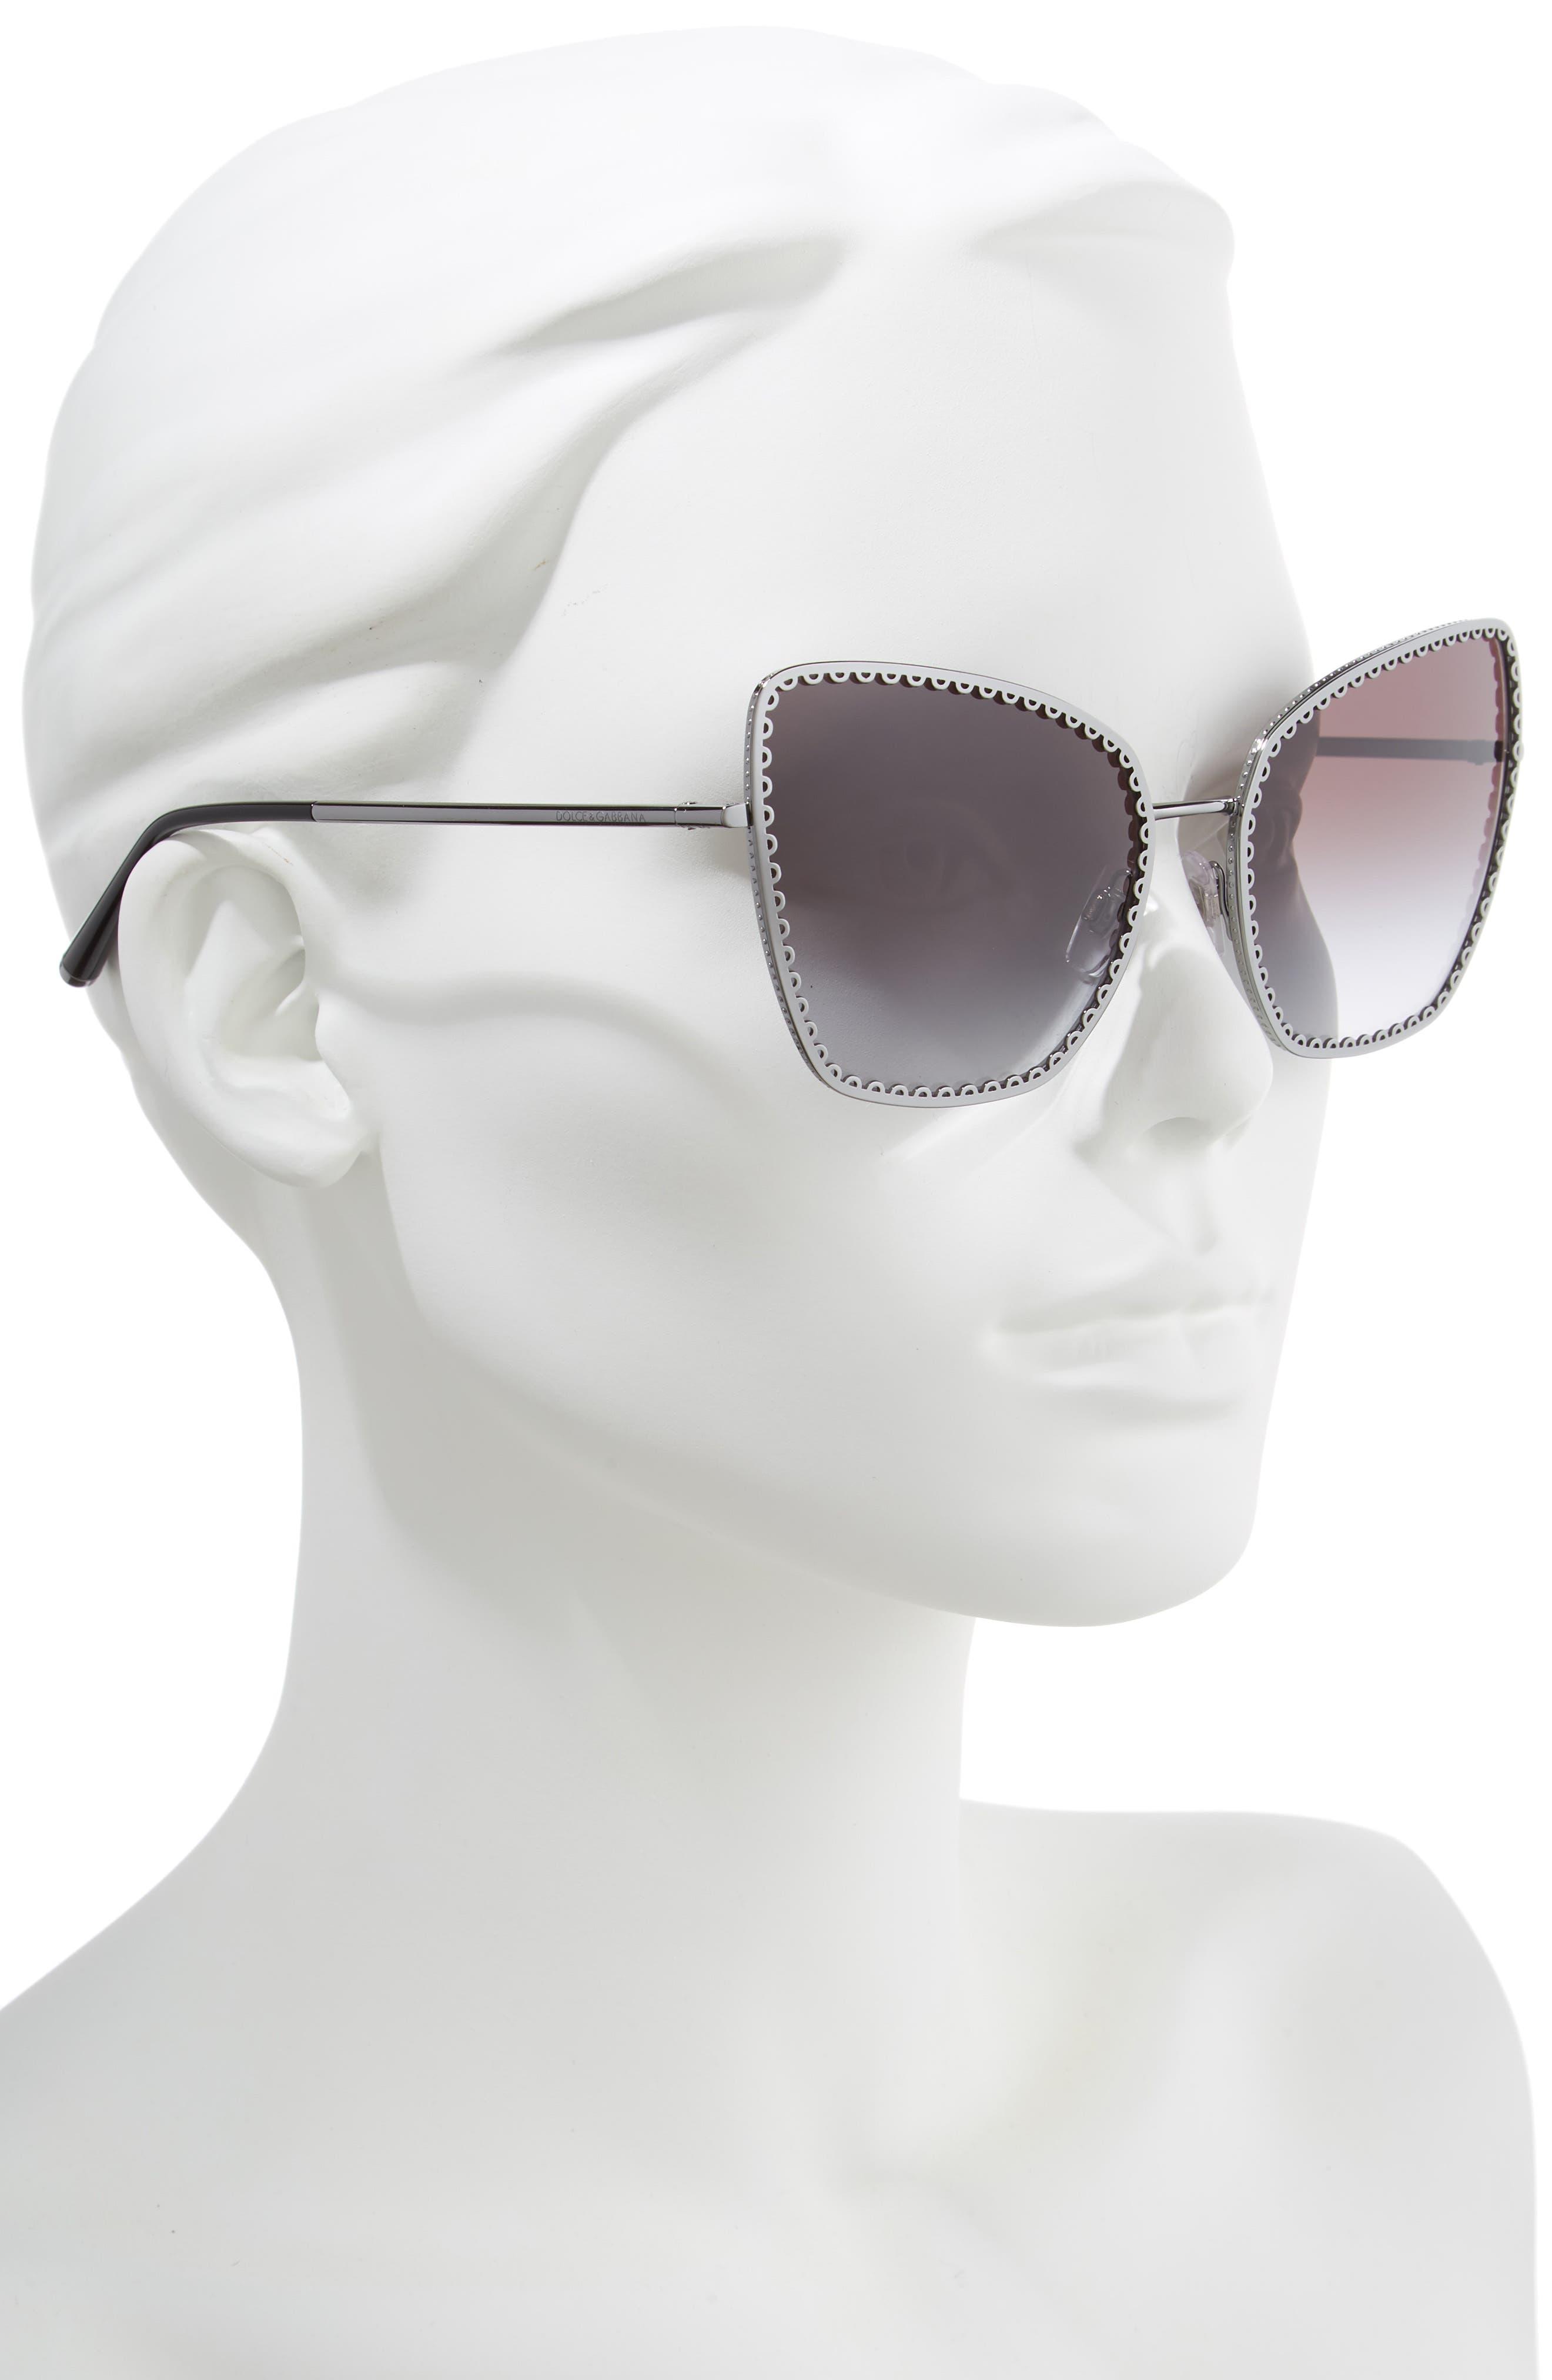 Sacred Heart 61mm Gradient Cat Eye Sunglasses,                             Alternate thumbnail 2, color,                             GUNMETAL GRADIENT